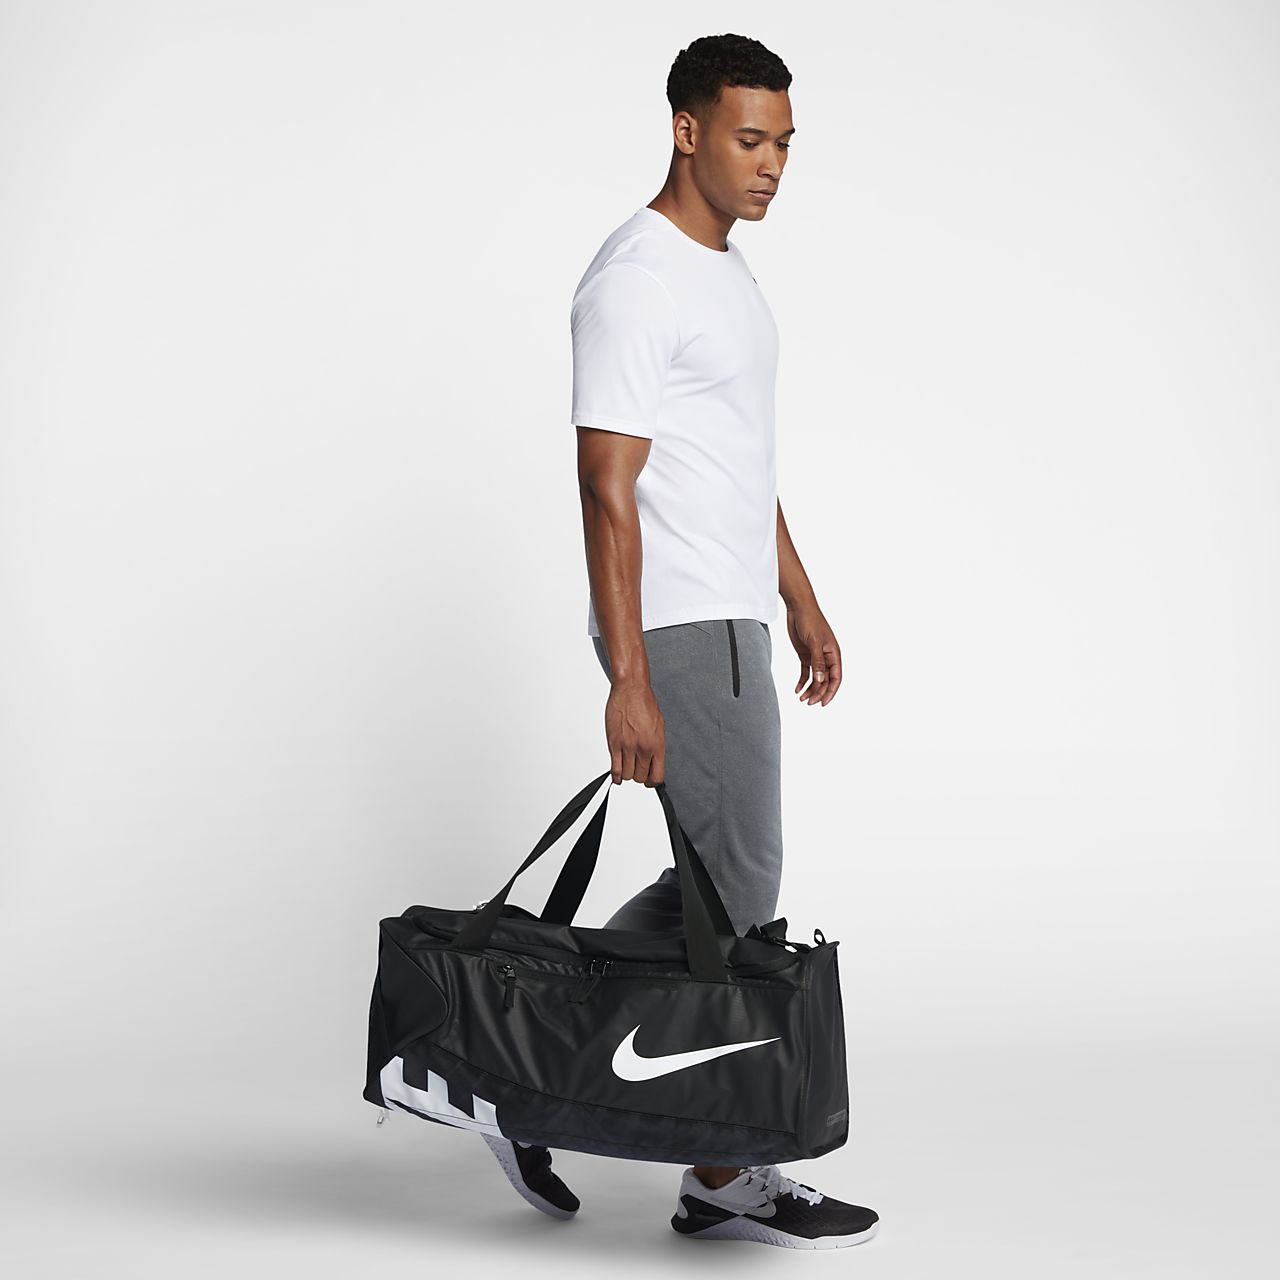 e786e12ca0 ... Τσάντα γυμναστηρίου Nike Alpha Adapt Cross Body (μέγεθος Large)